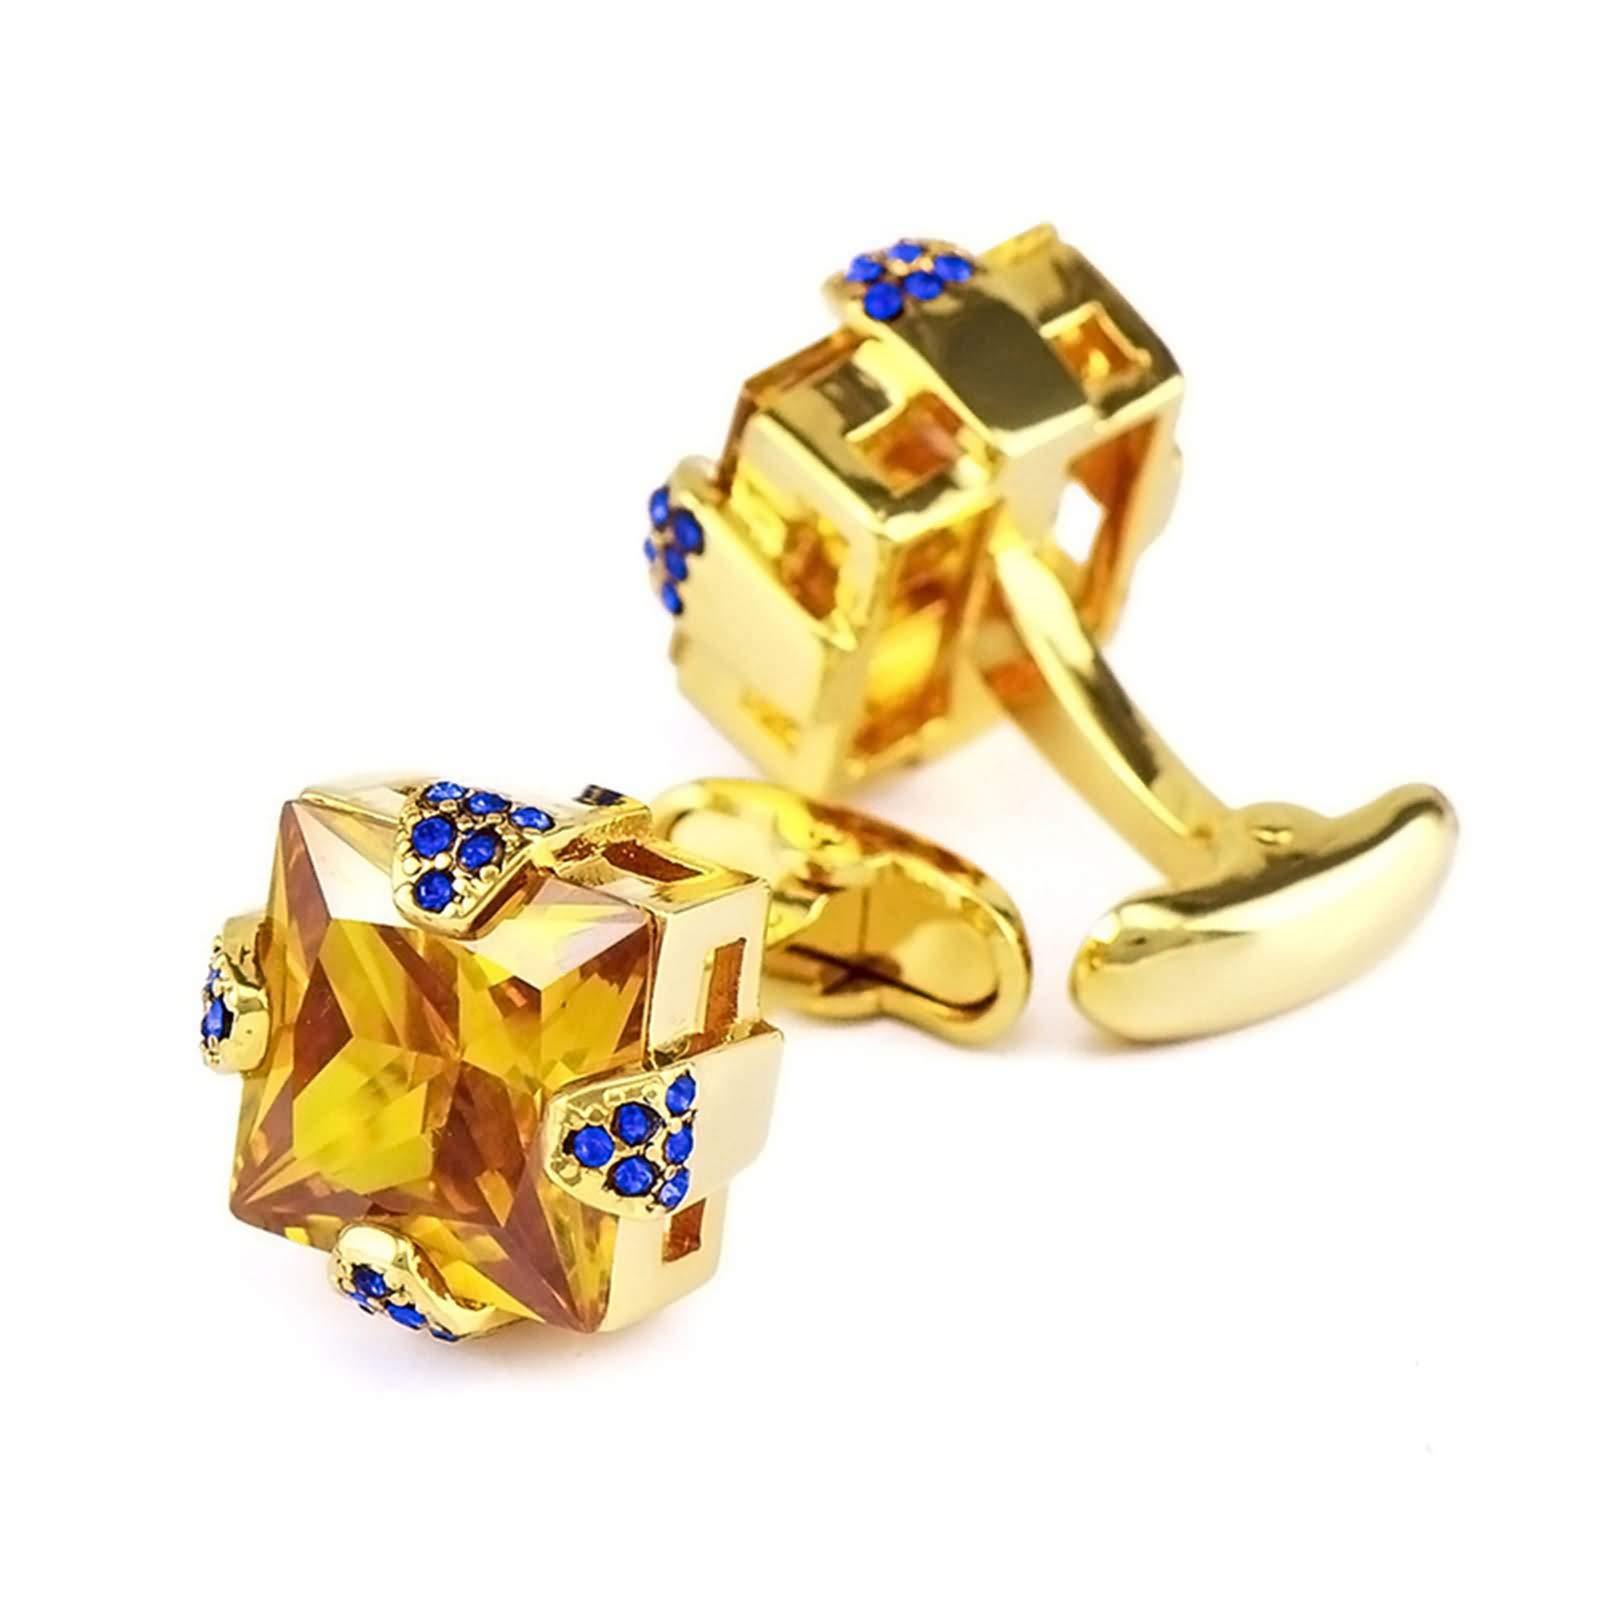 Adisaer Cufflinks Champagne Copper Square Cubic Zirconia Champagne Blue Dad Cufflinks